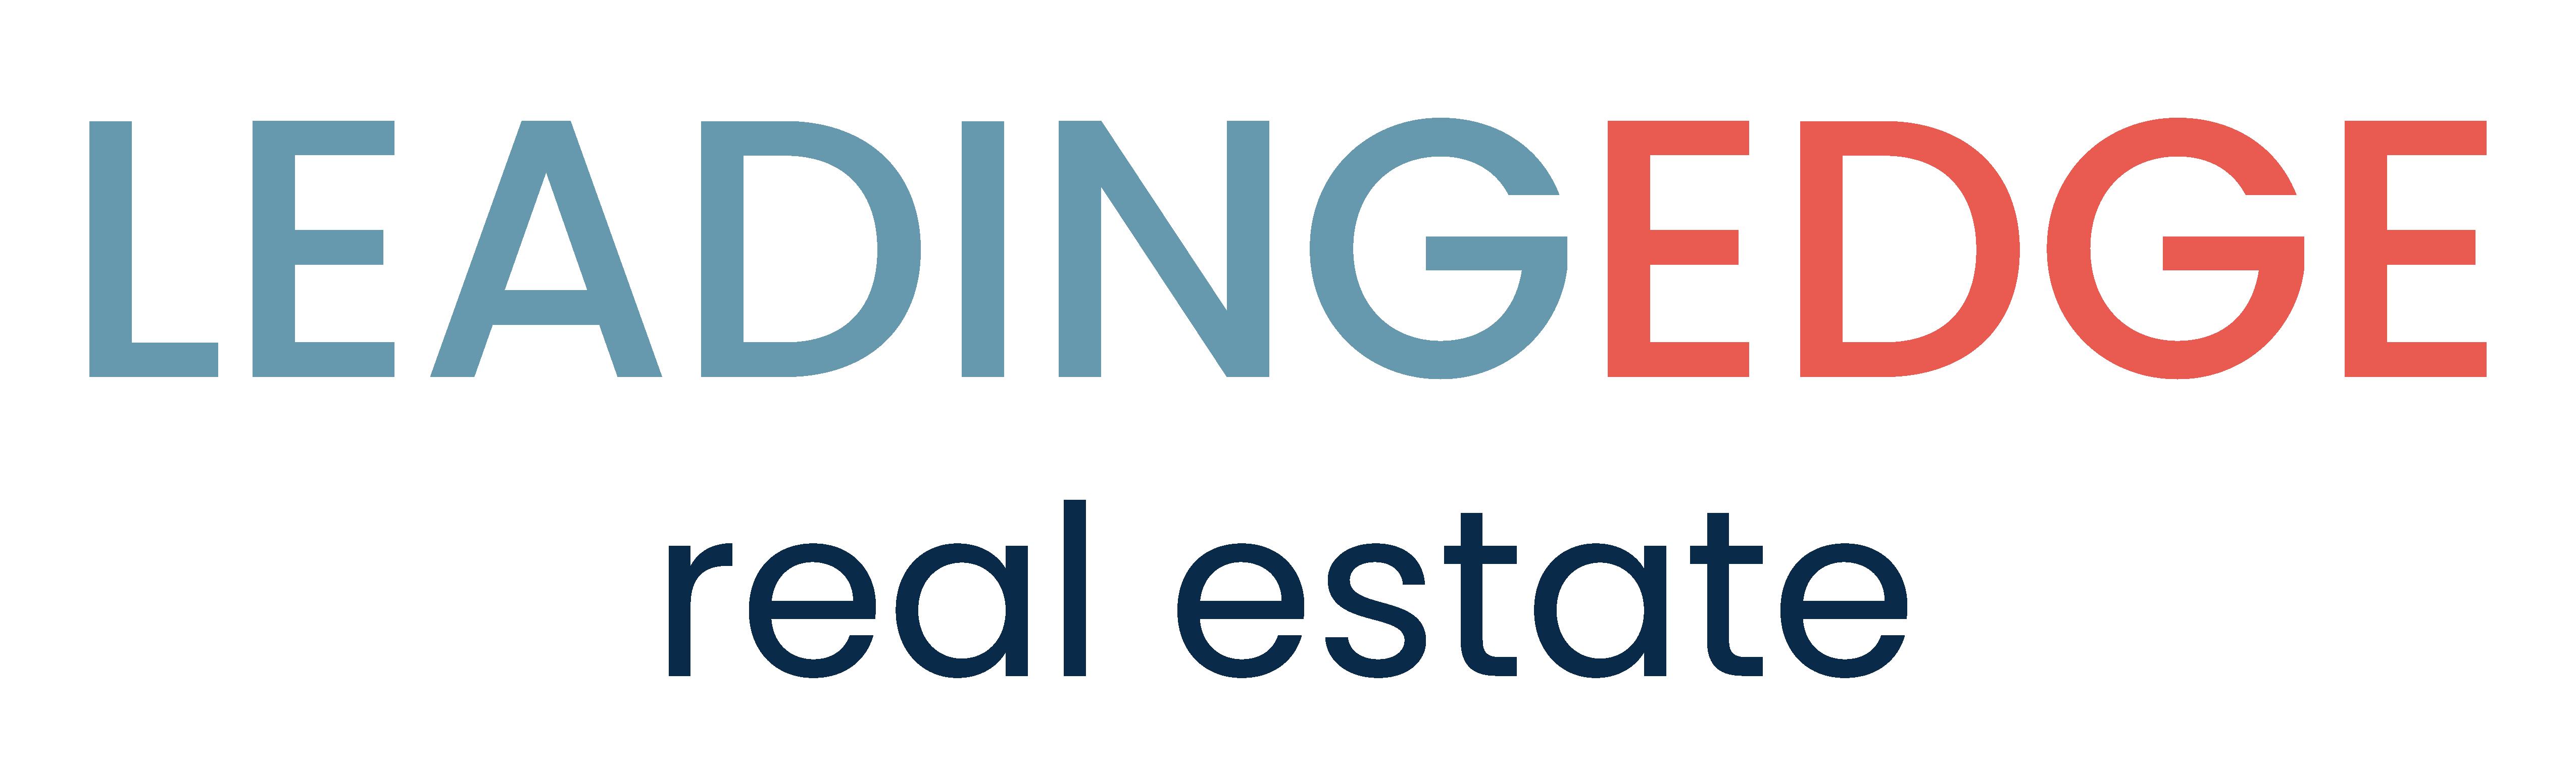 logo-multi-color.png